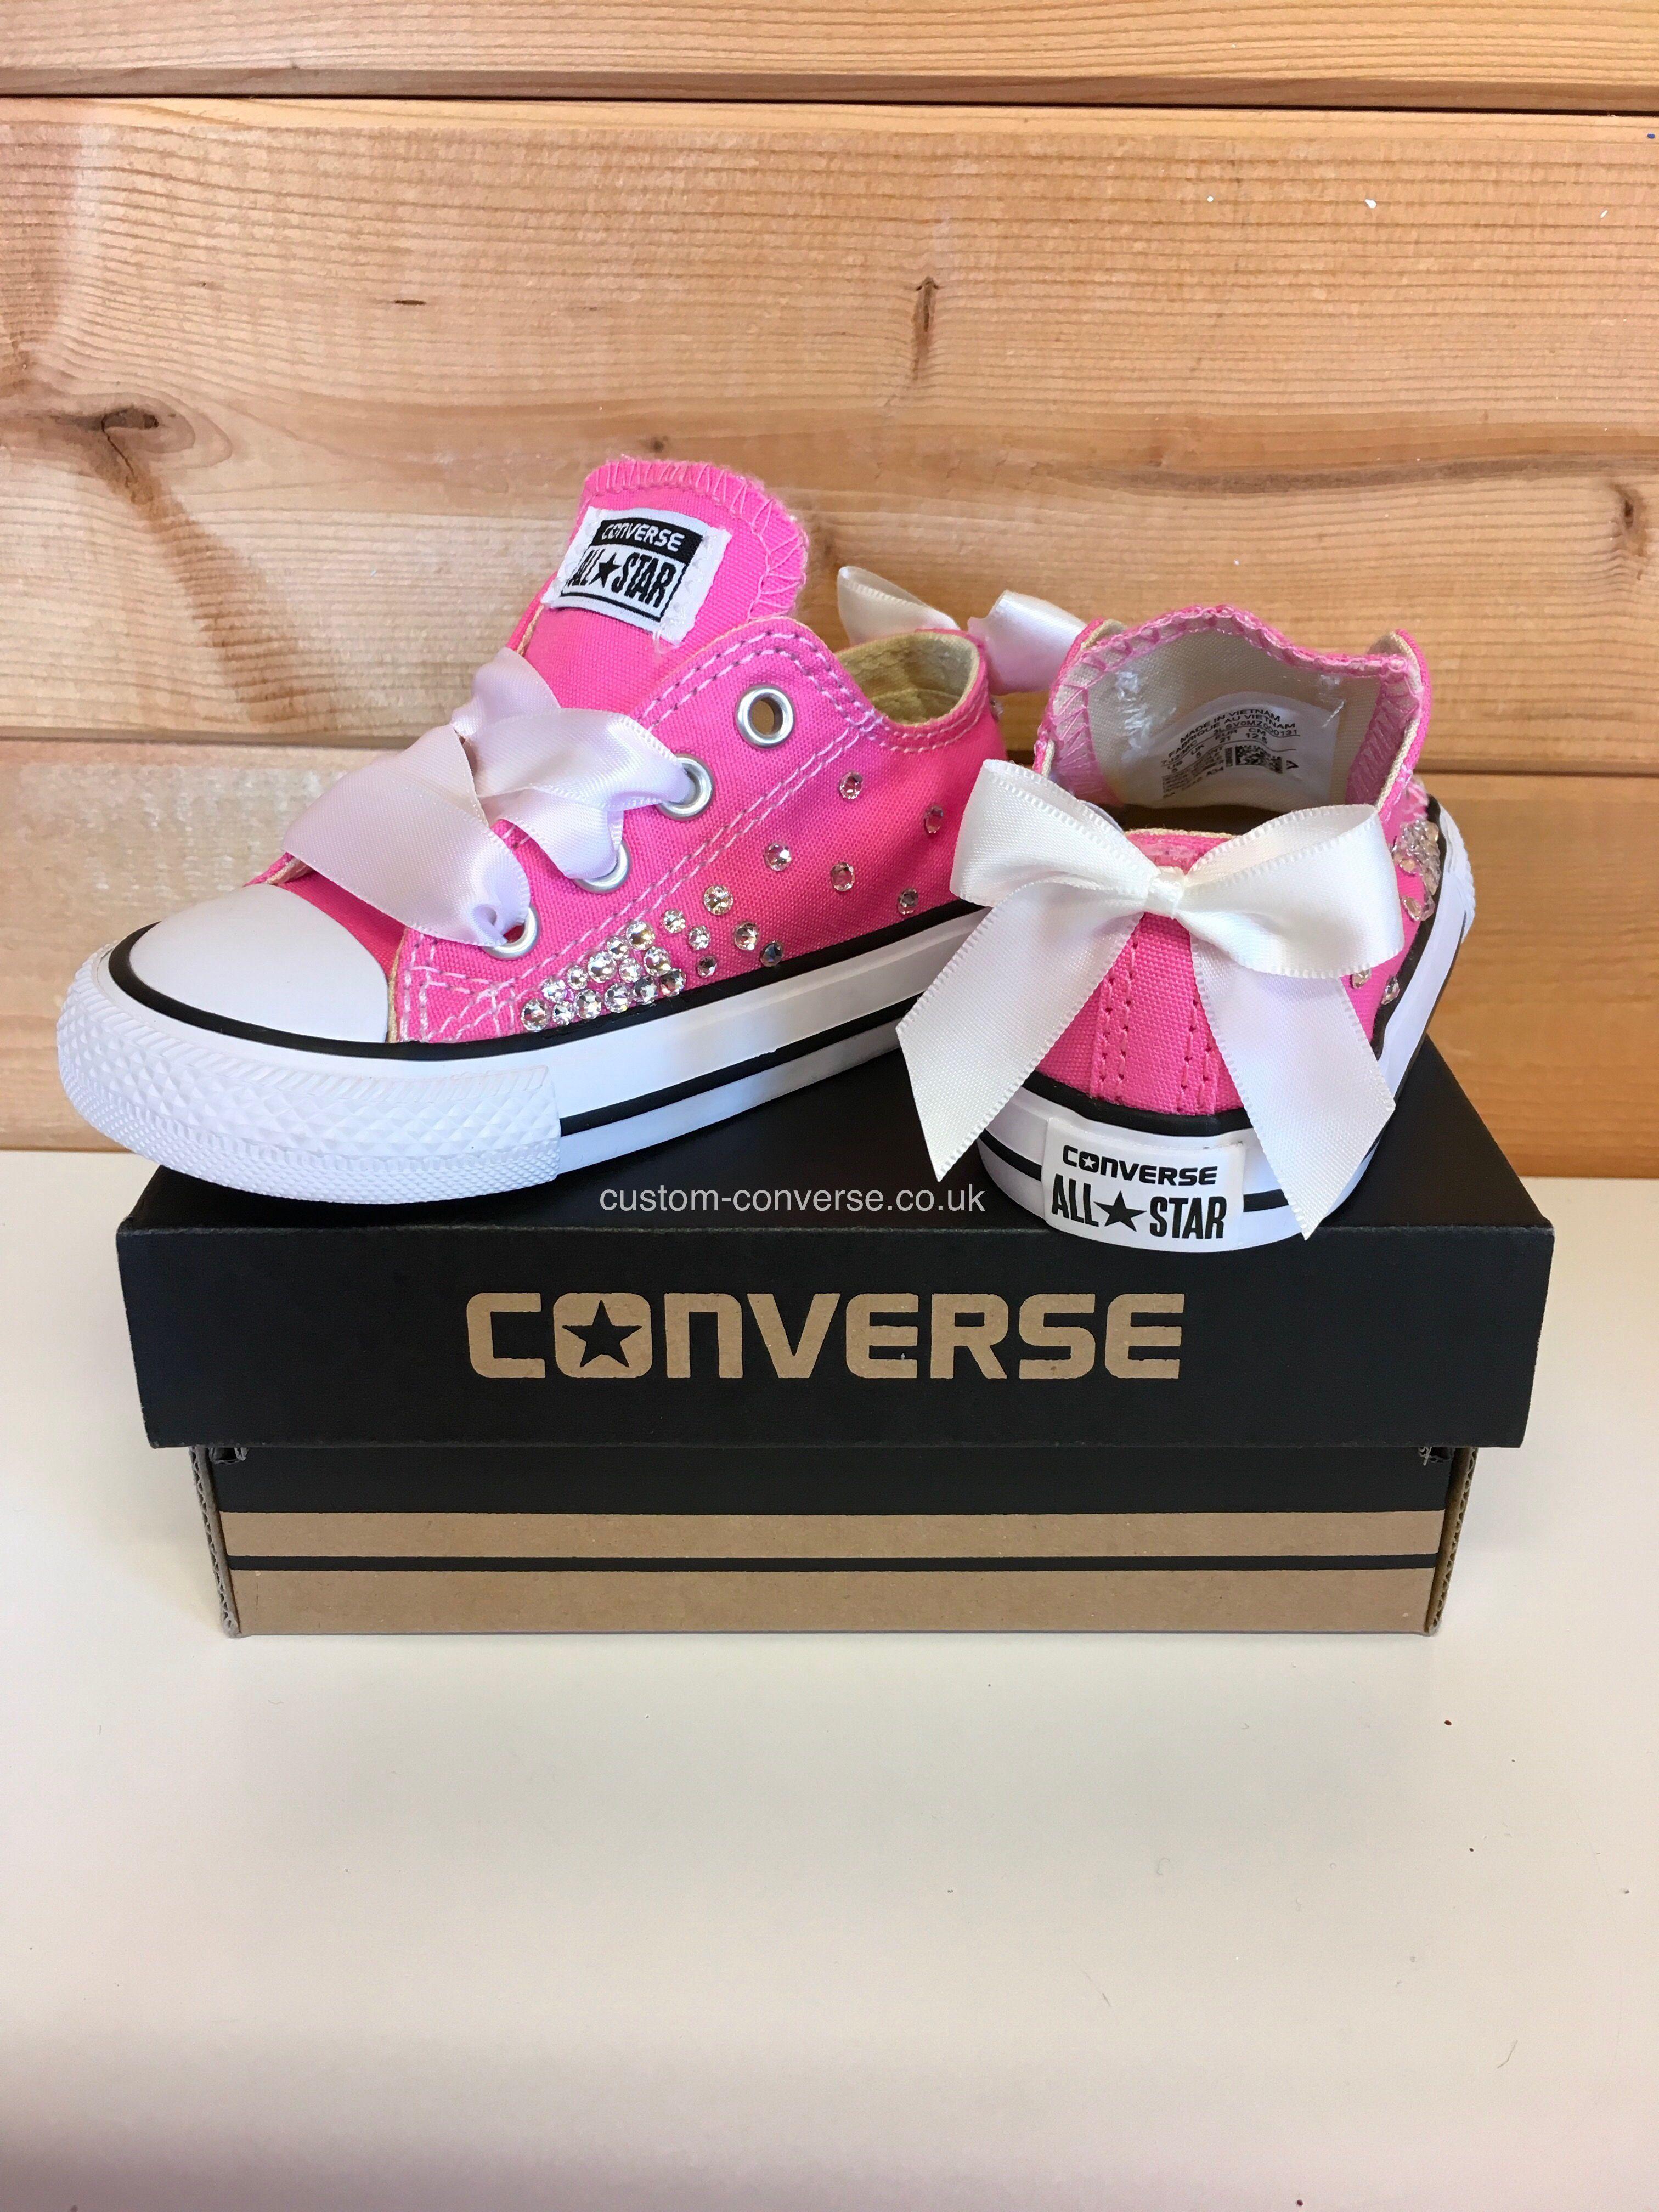 b26dabd138c0 Pink girls Swarovski low top converse with white ribbon laces and bows   weddingconverse  flowergirl